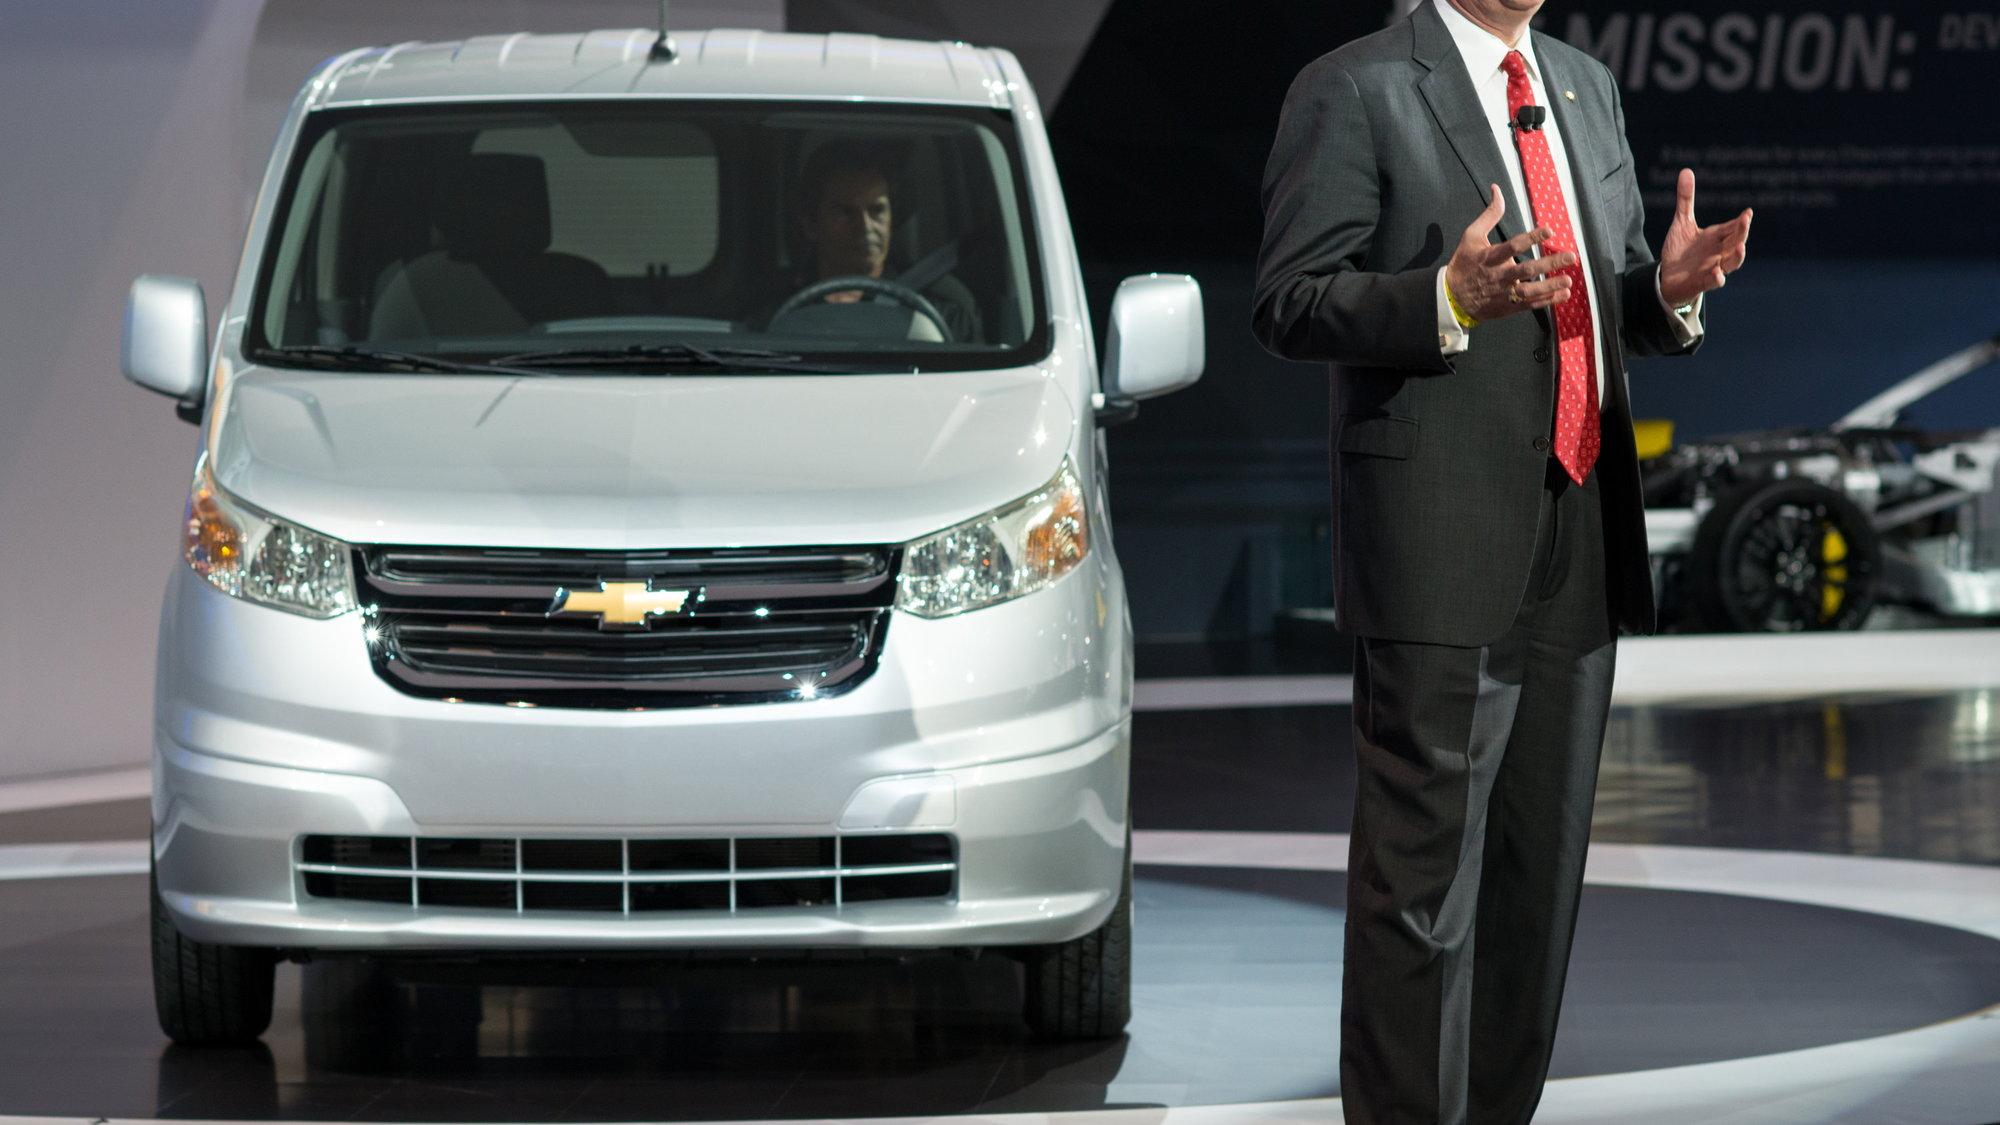 2015 Chevrolet City Express van, 2014 Chicago Auto Show